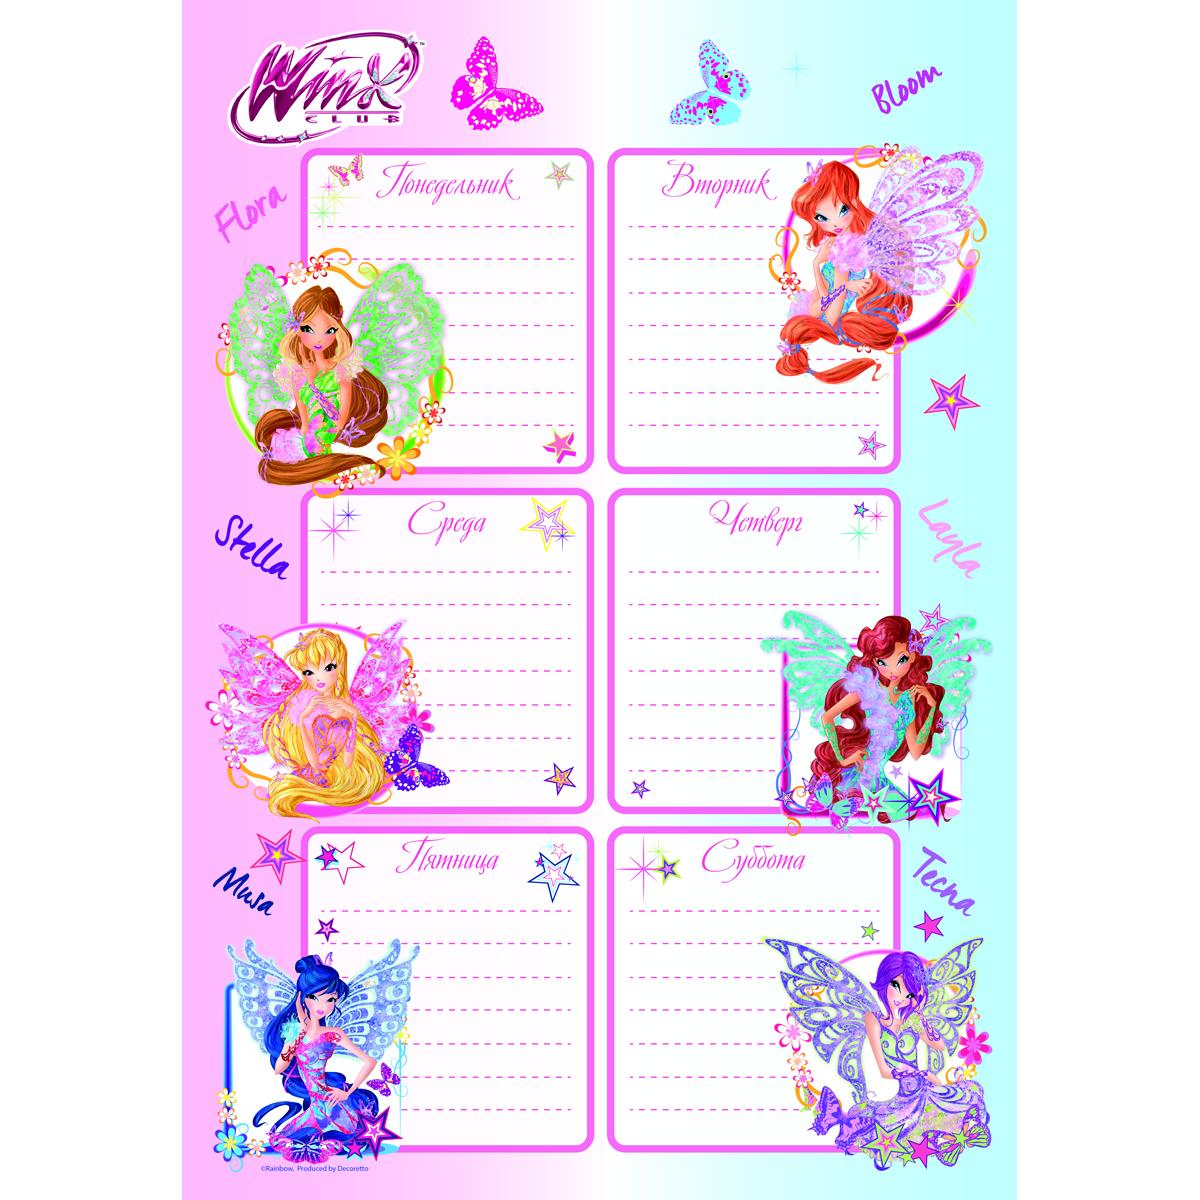 Decoretto Наклейка Школьное расписание Winx decoretto виниловая наклейка комнатное растение